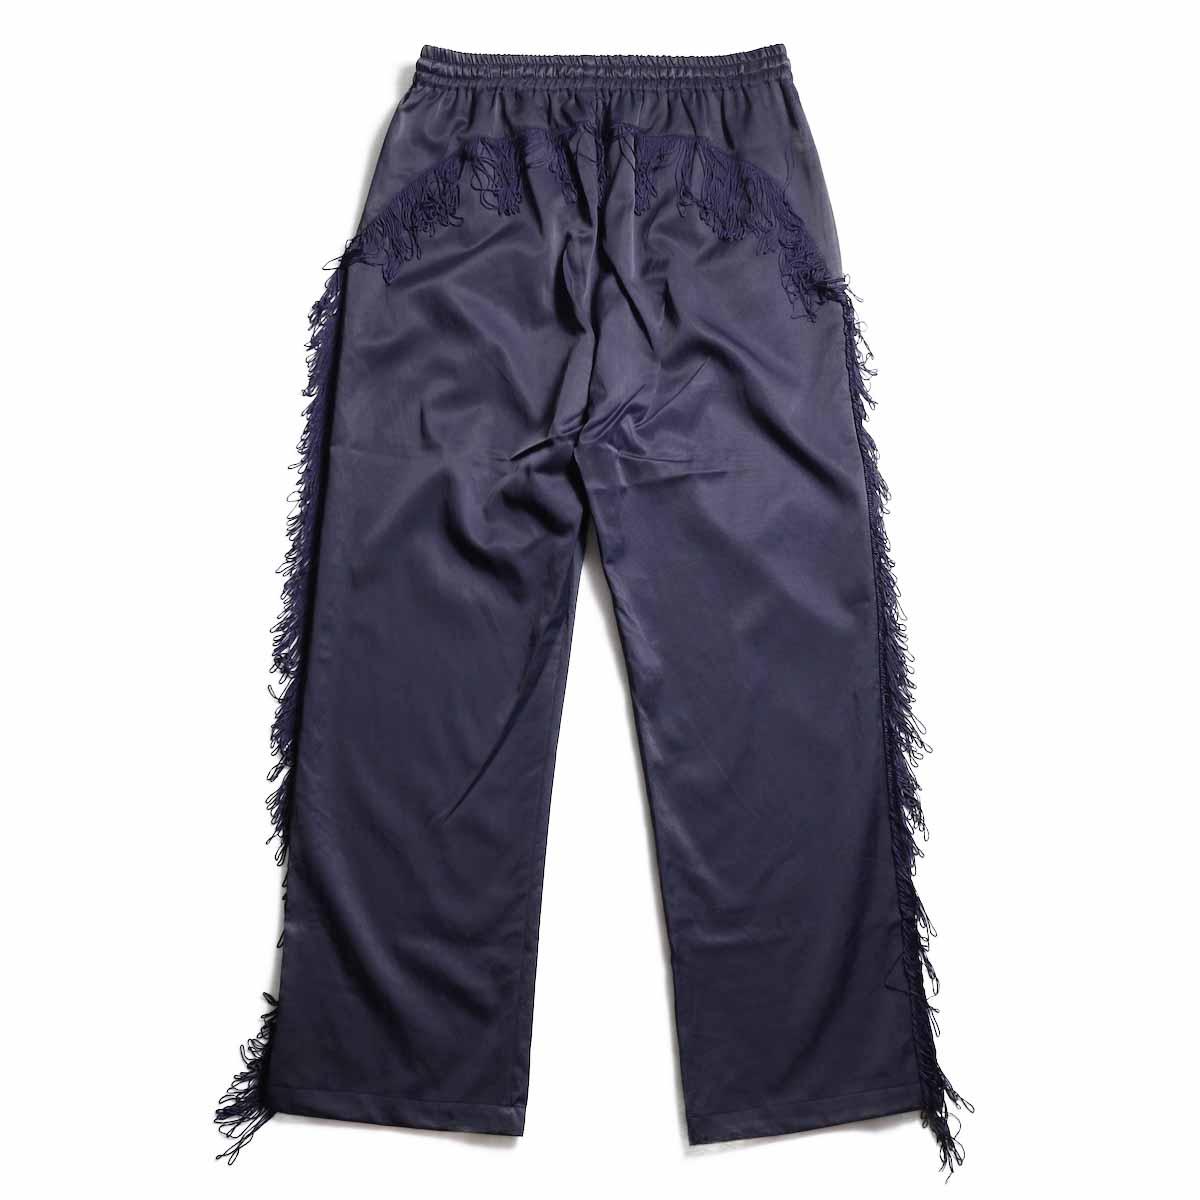 Needles / Fringe Cowboy Pant -R/C Twill Sateen (Purple) 背面